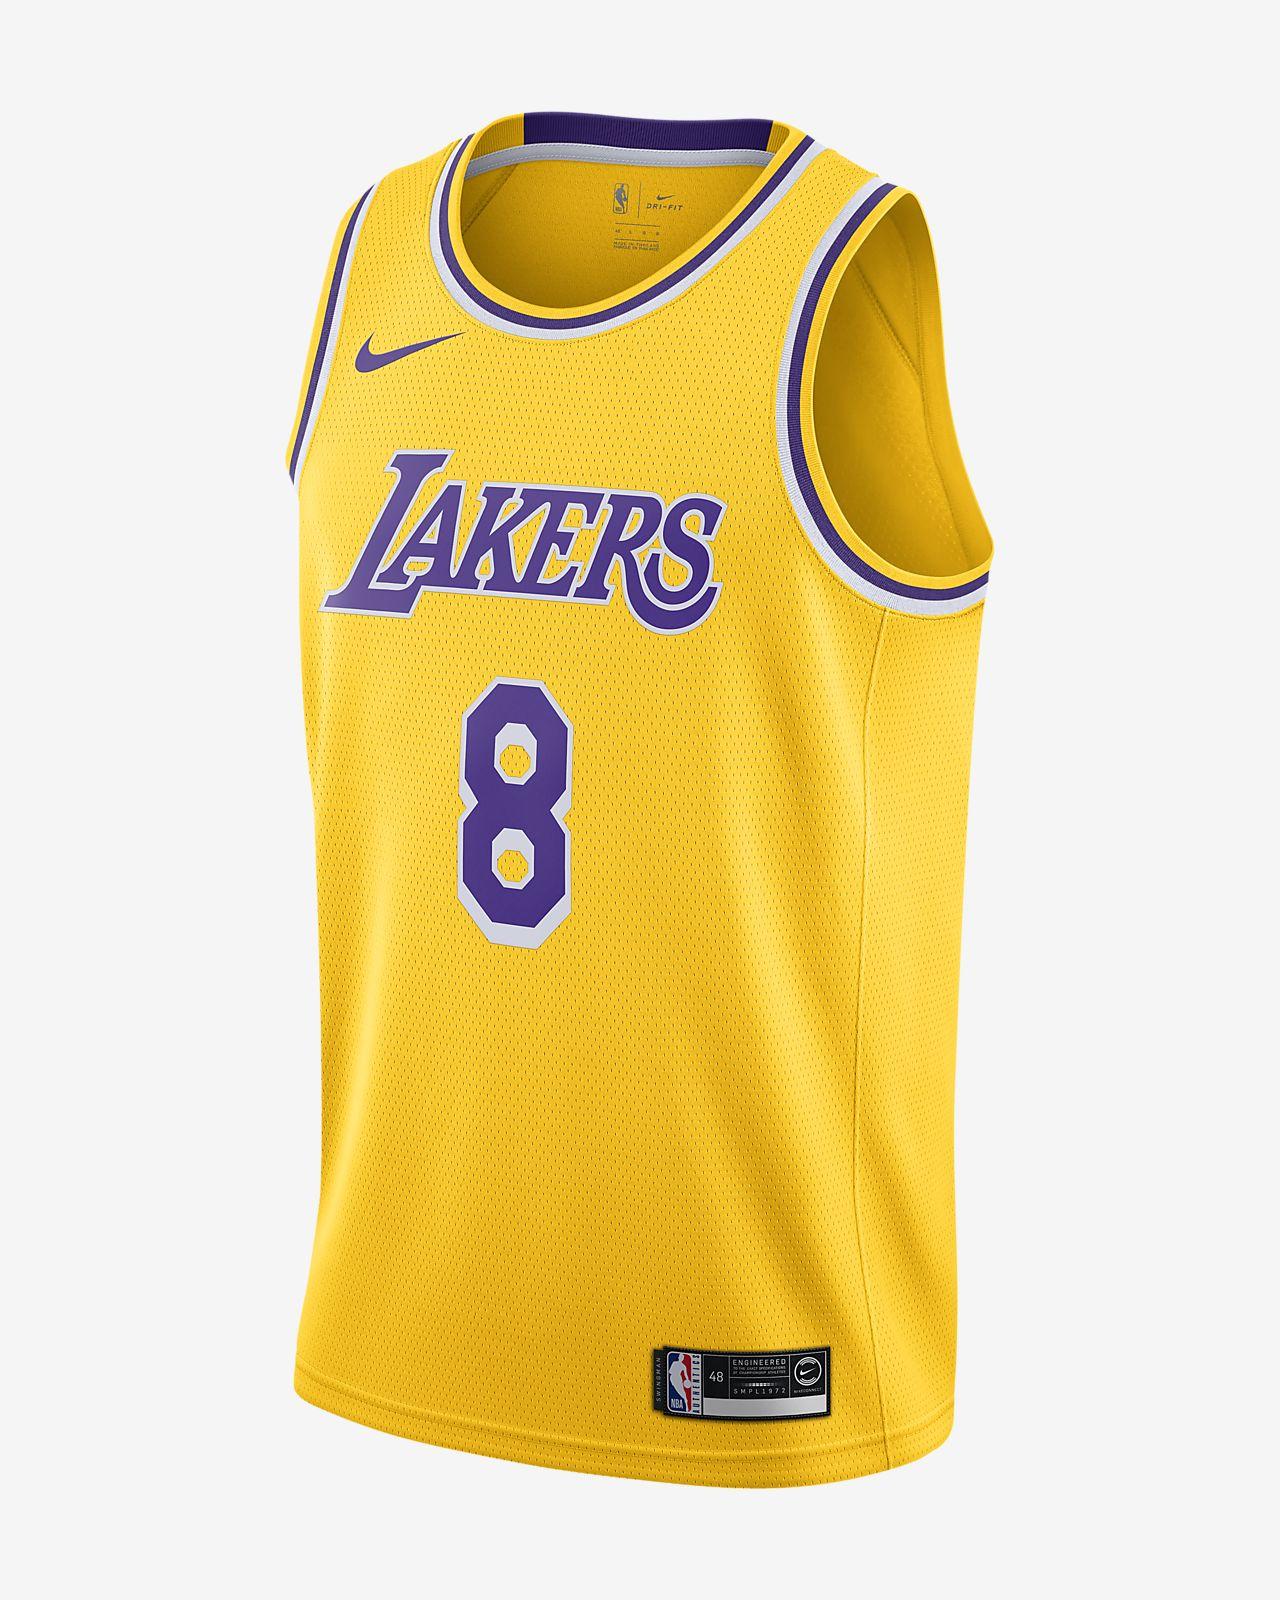 Męska koszulka Nike NBA Connected Jersey Kobe Bryant Icon Edition Swingman (Los Angeles Lakers)